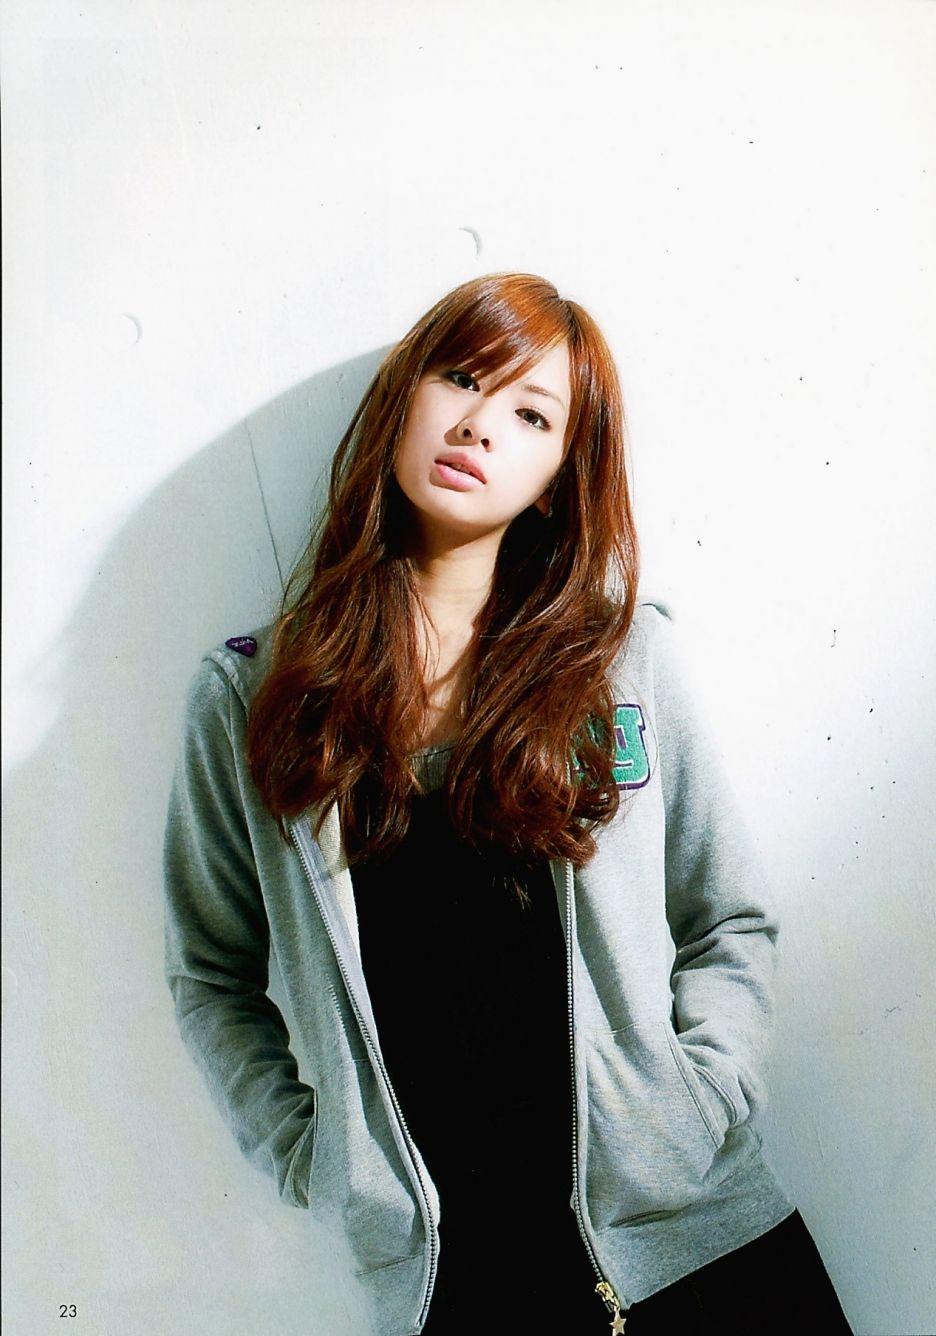 Keiko kitagawa reiko hino pinterest keiko kitagawa and fashion thecheapjerseys Images